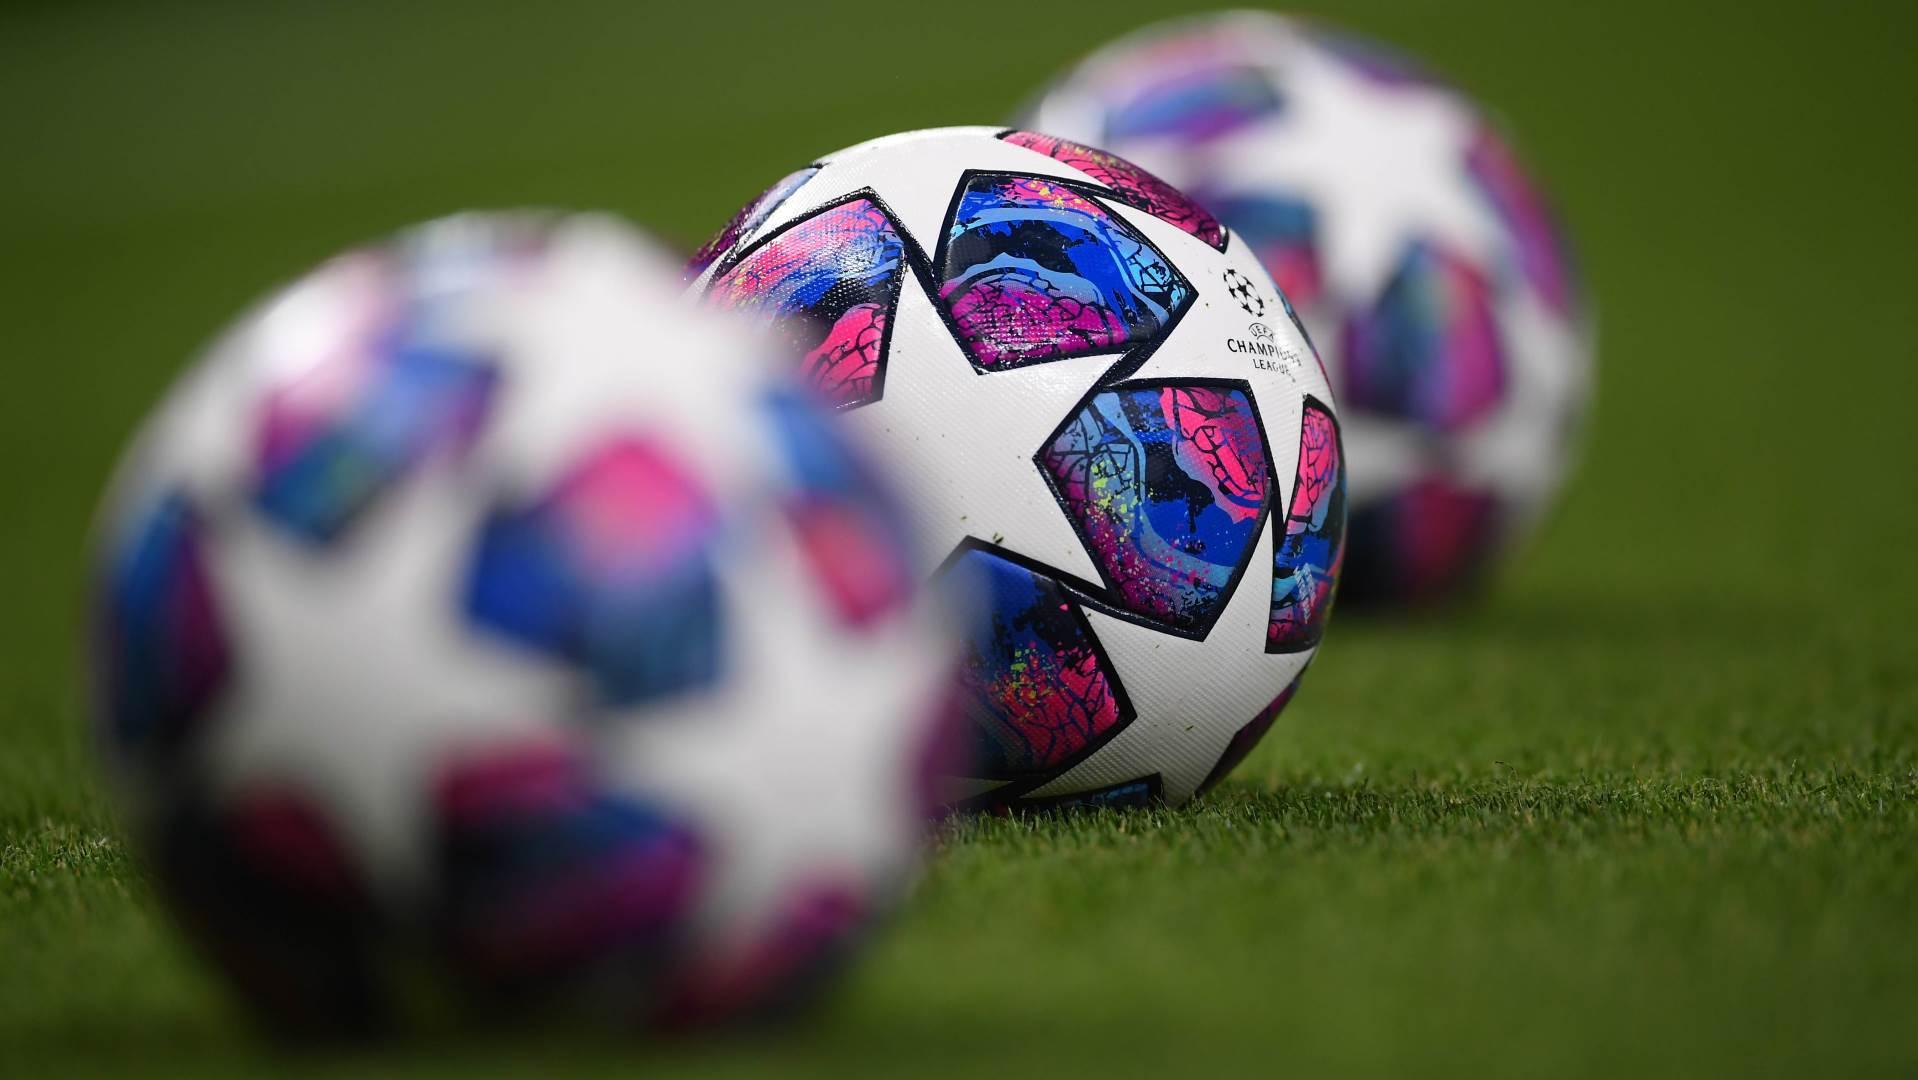 pokrivalica, fudbal, lopta, liga šampiona